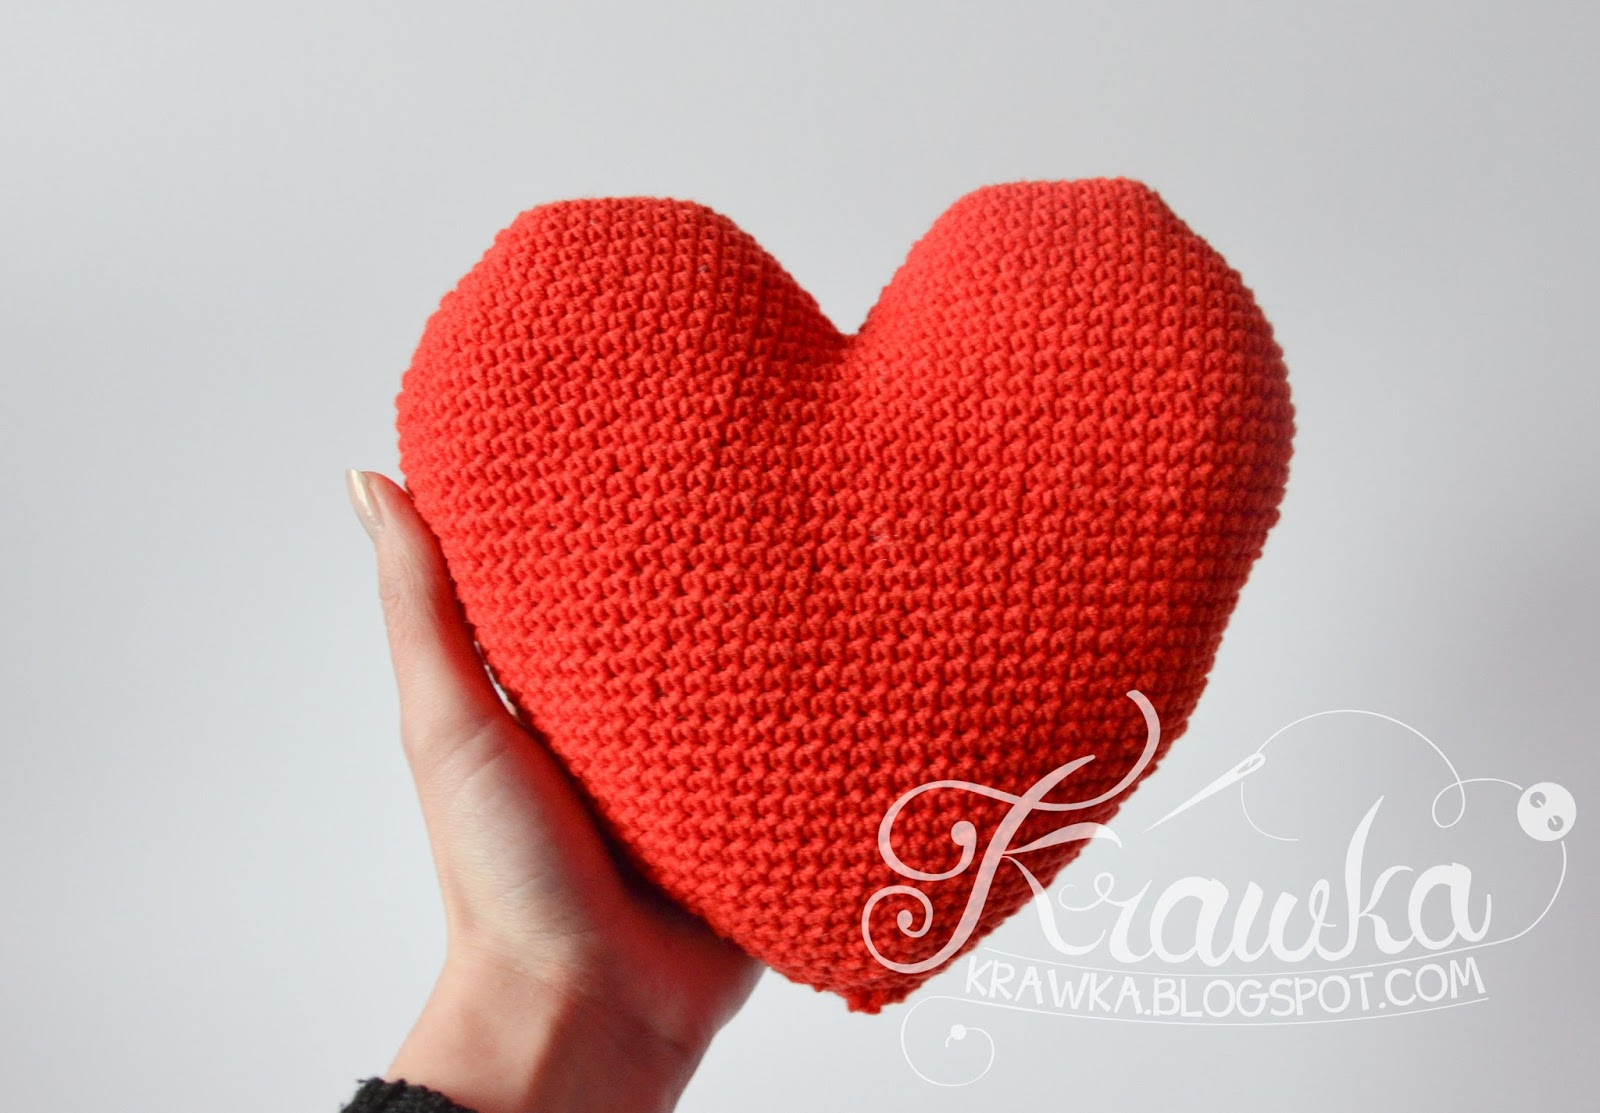 Krawka Heart Pillow Free Pattern